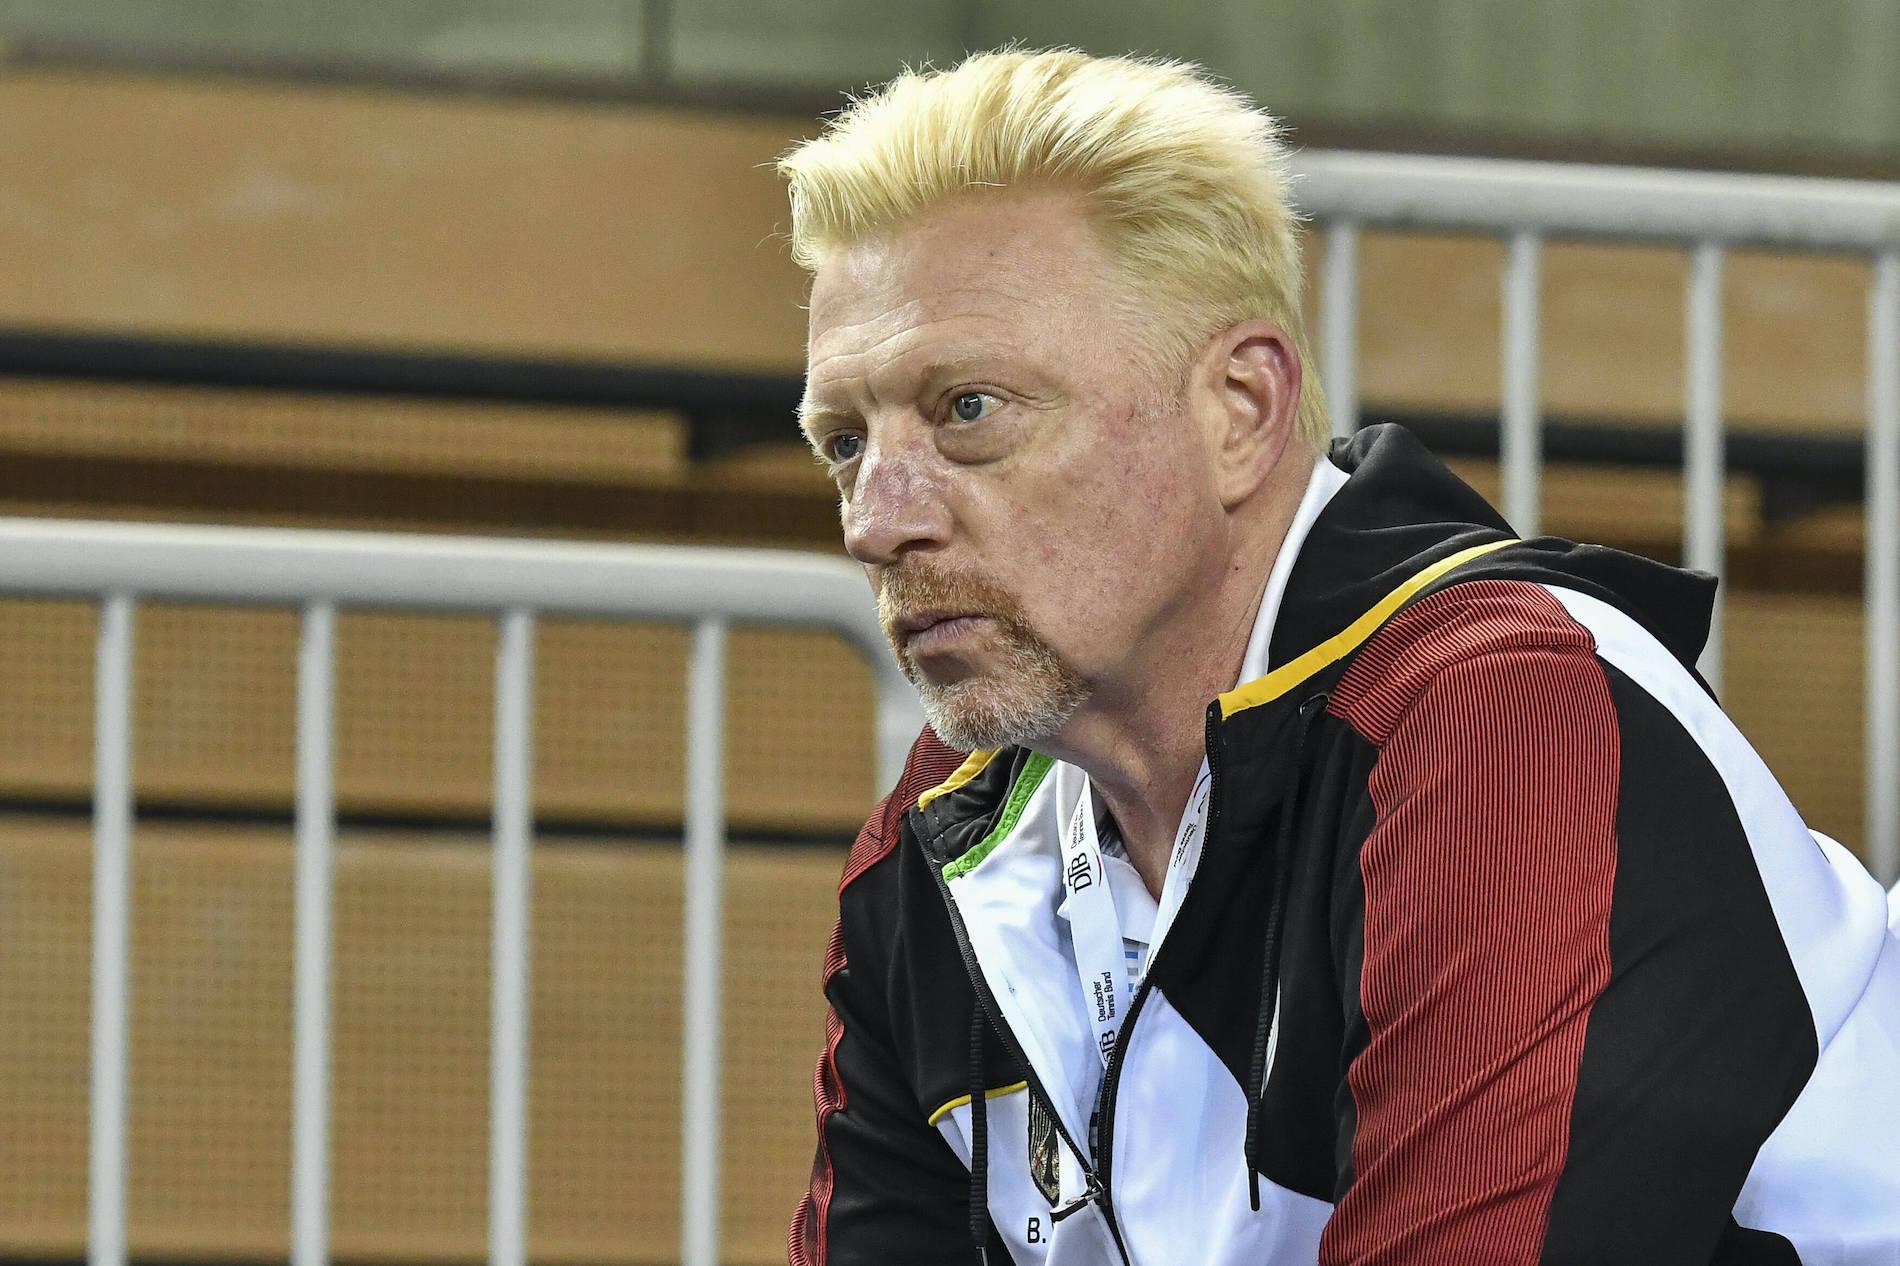 Boris Becker - Germany